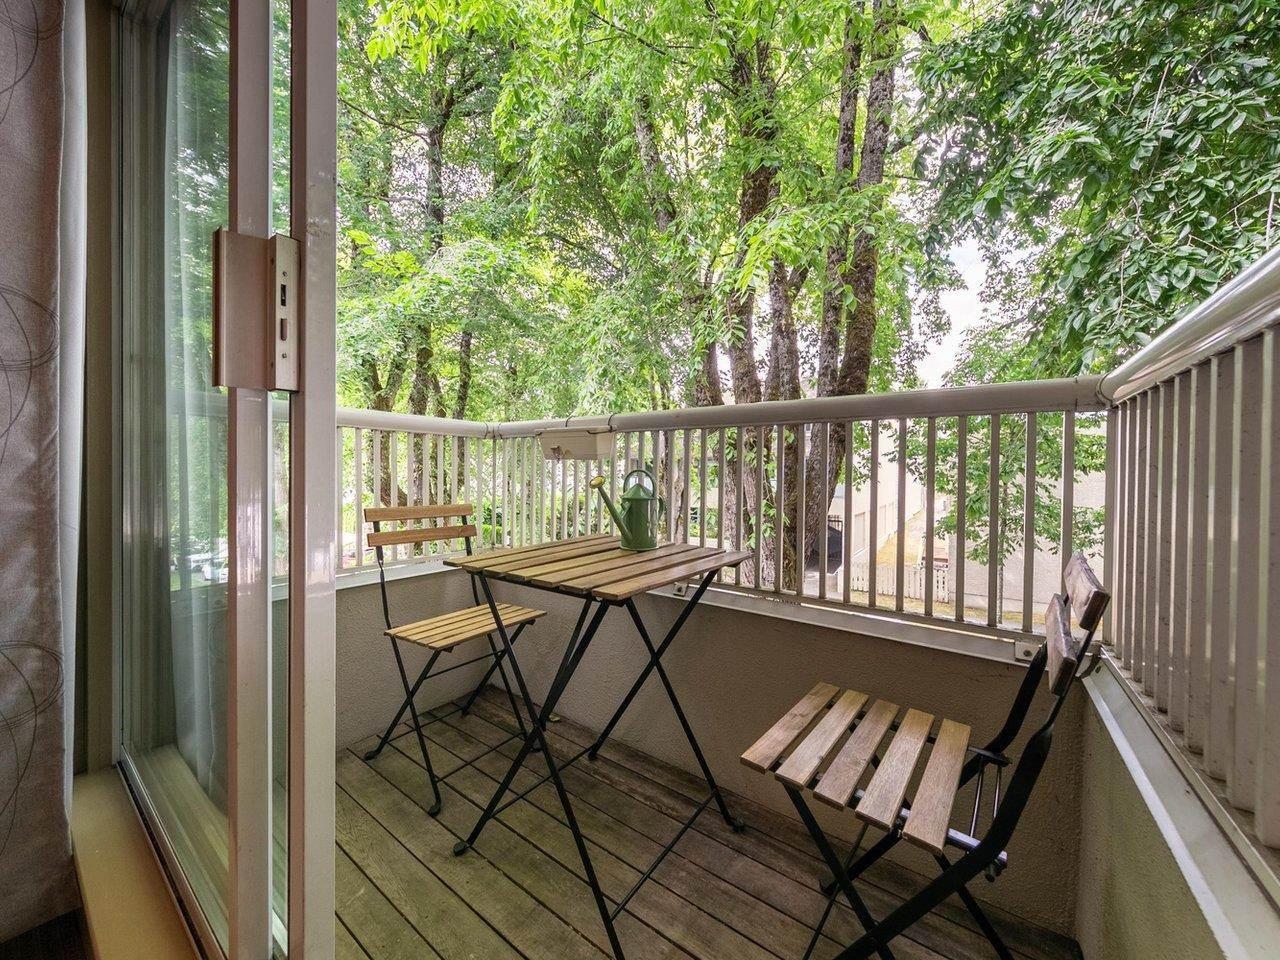 102 3626 W 28TH AVENUE - Dunbar Apartment/Condo for sale, 2 Bedrooms (R2602866)